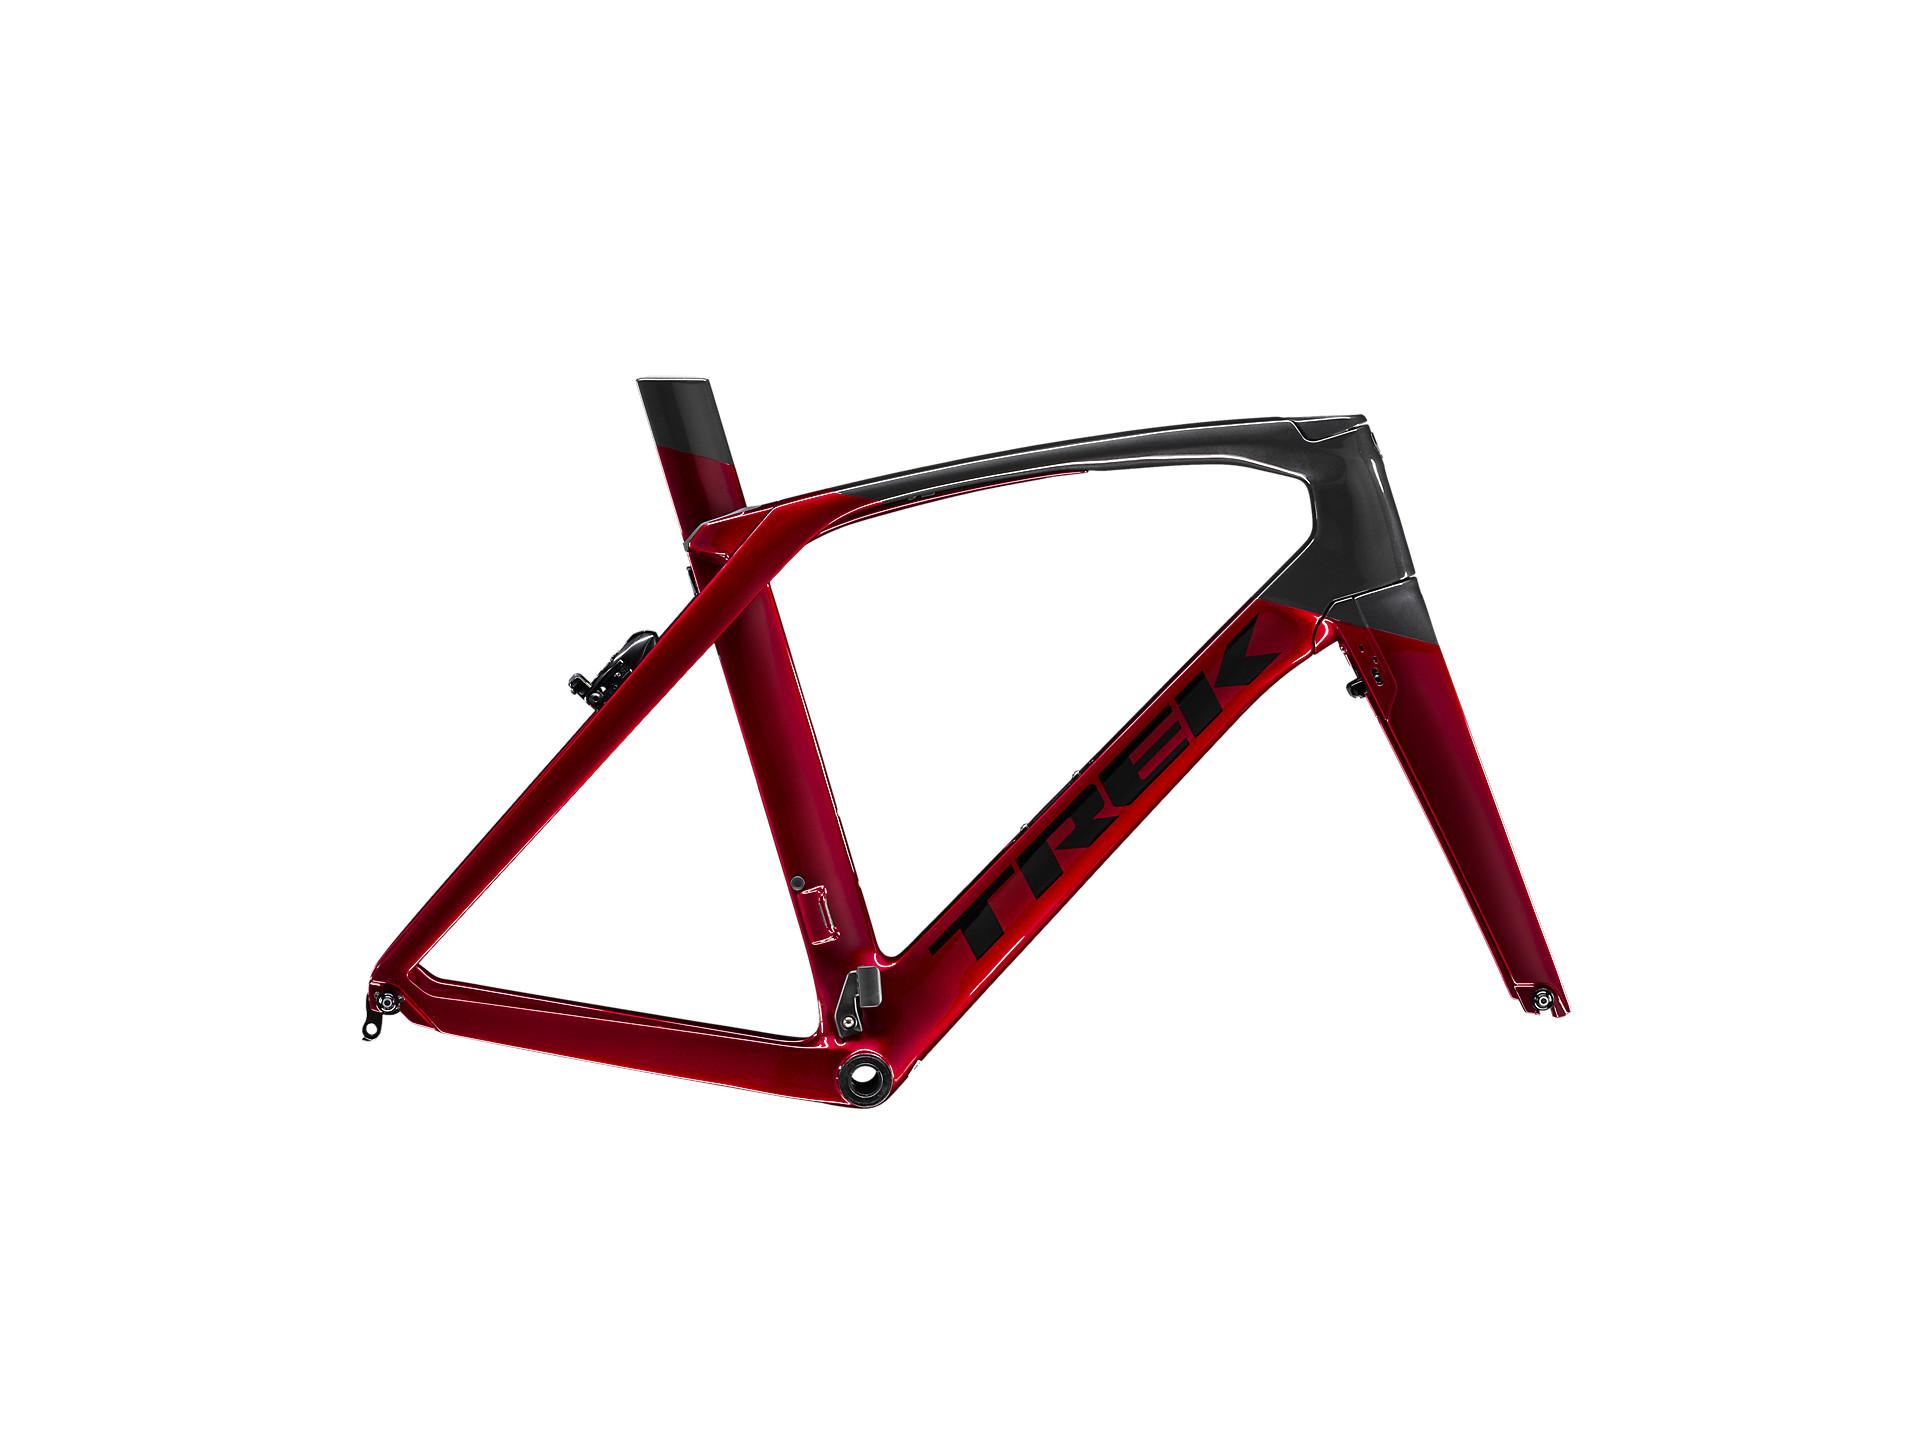 Kit Telaio Madone Slr Trek Bikes It